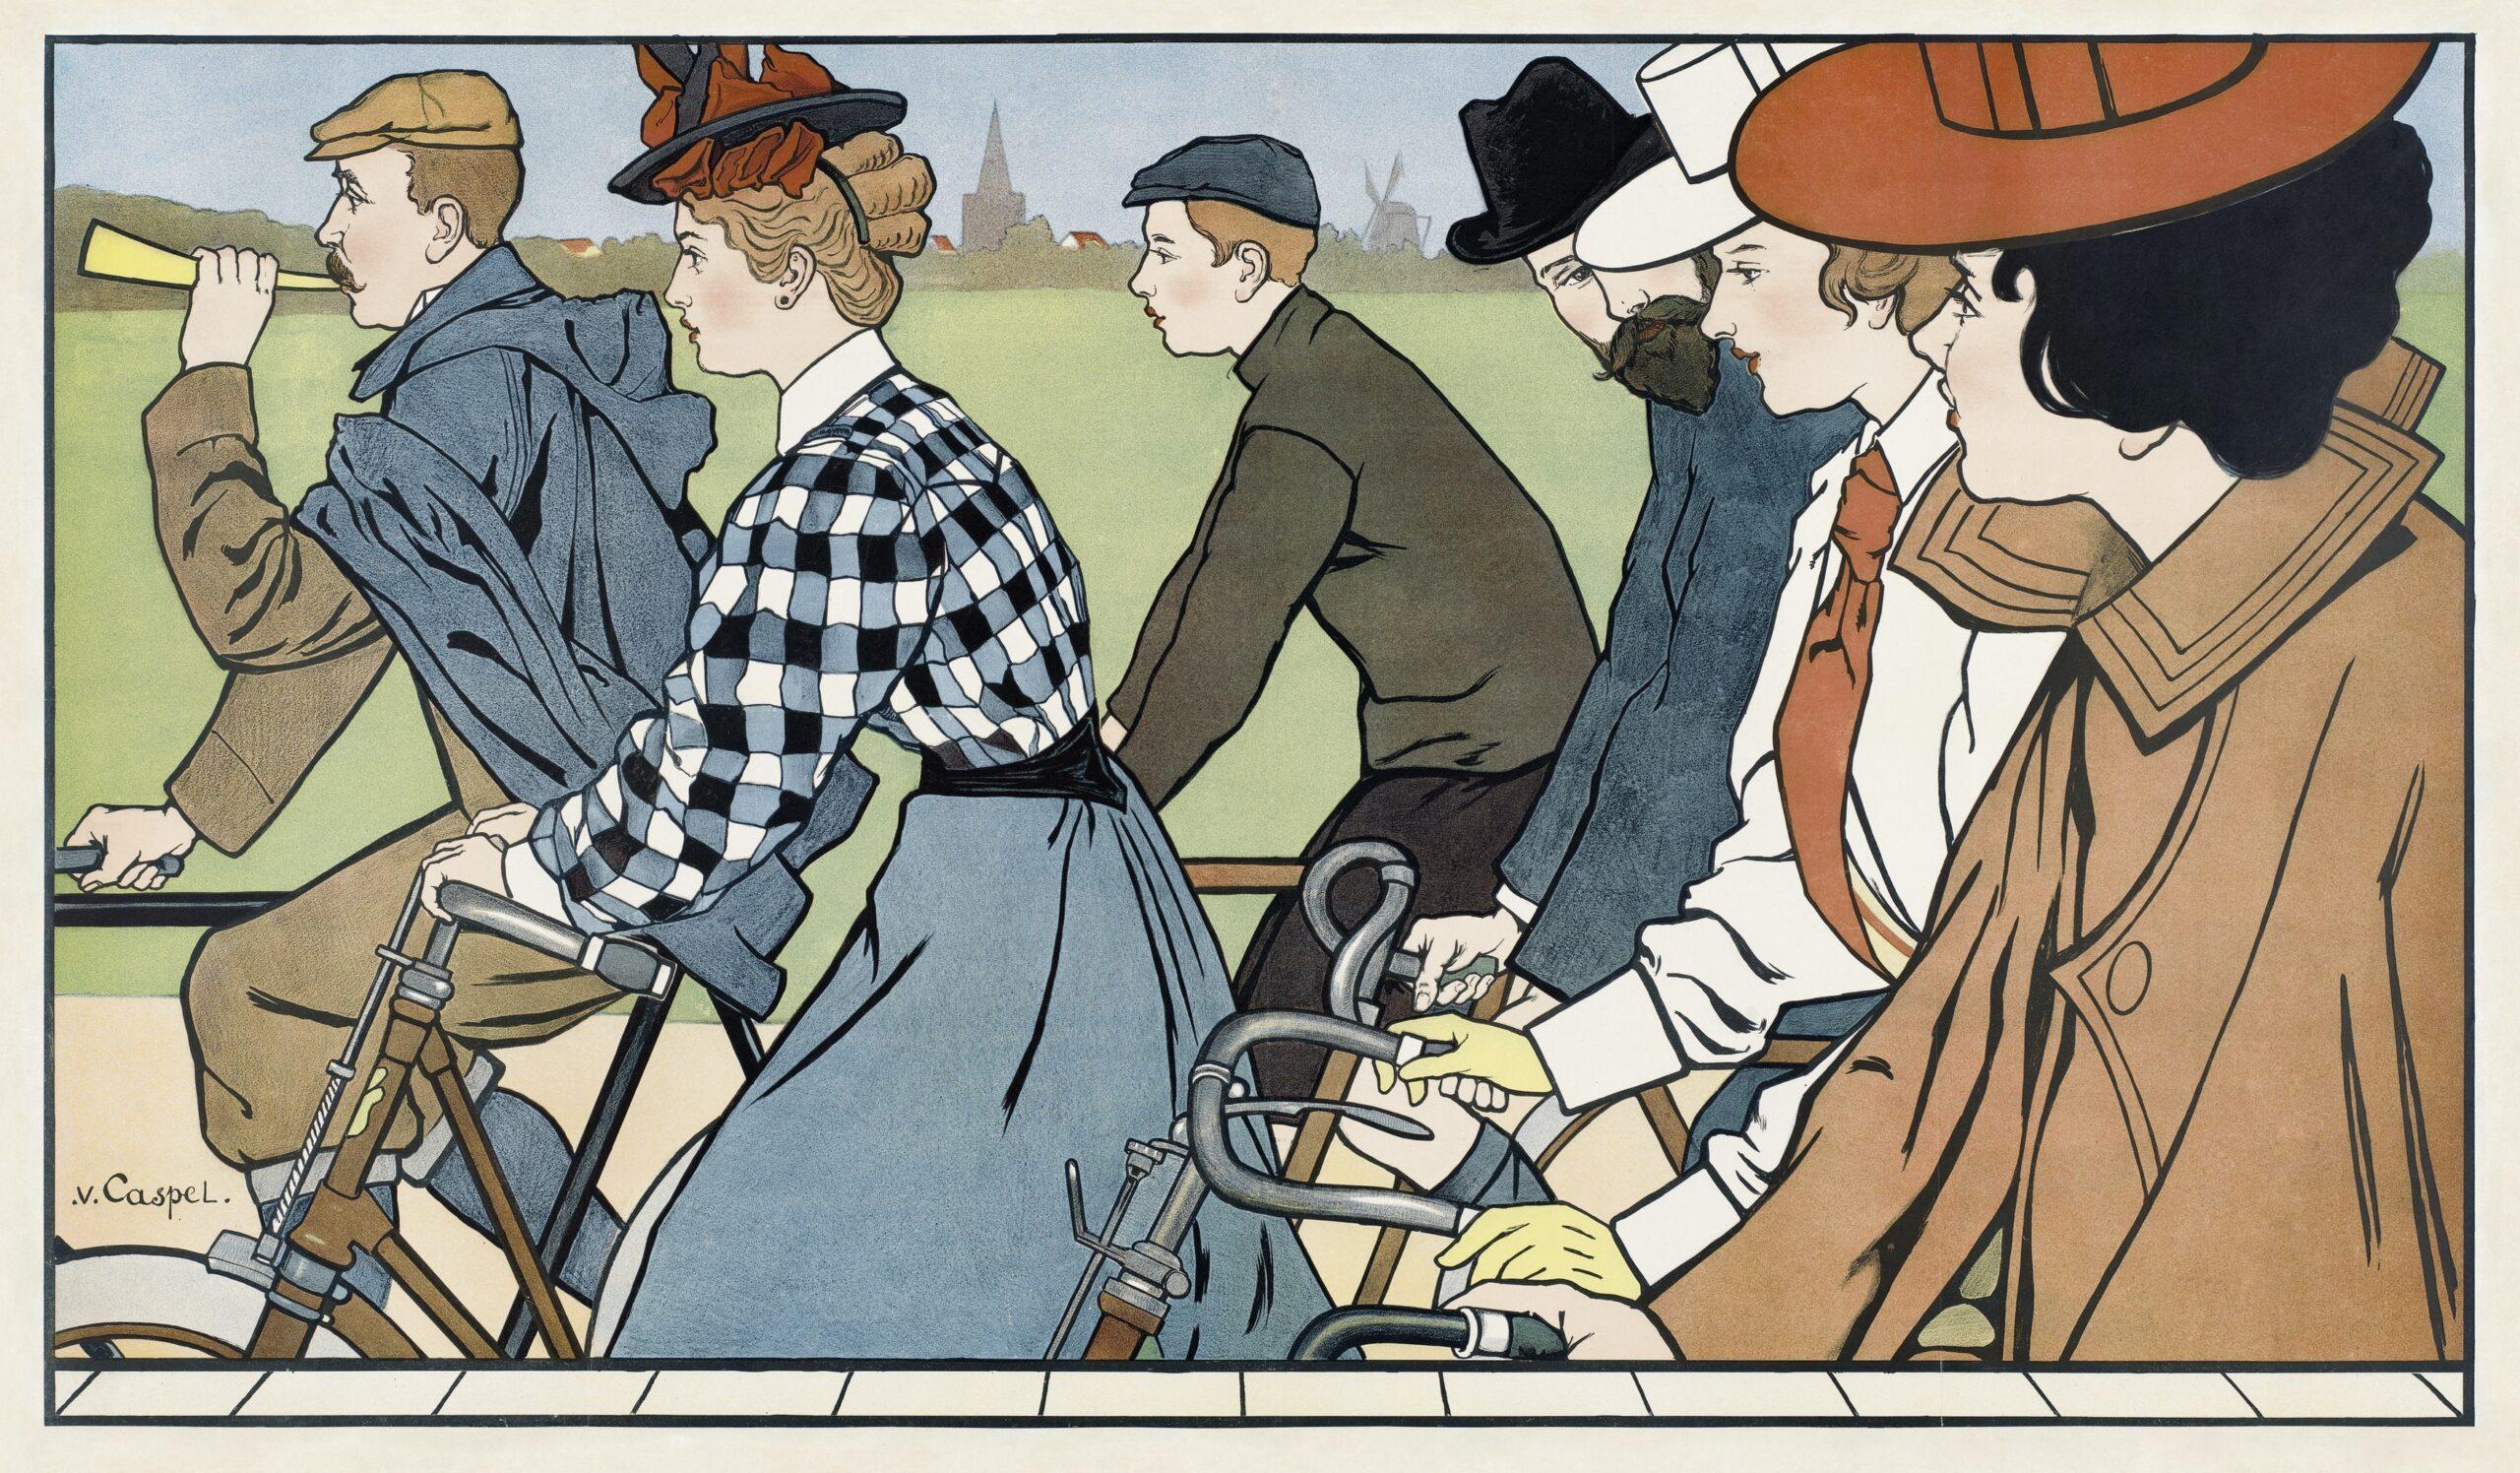 Hamers rijwielen (1912) by Johann Georg van Caspel. Victorian people riding bicycles. Original from The Rijksmuseum. Digitally enhanced by rawpixel.